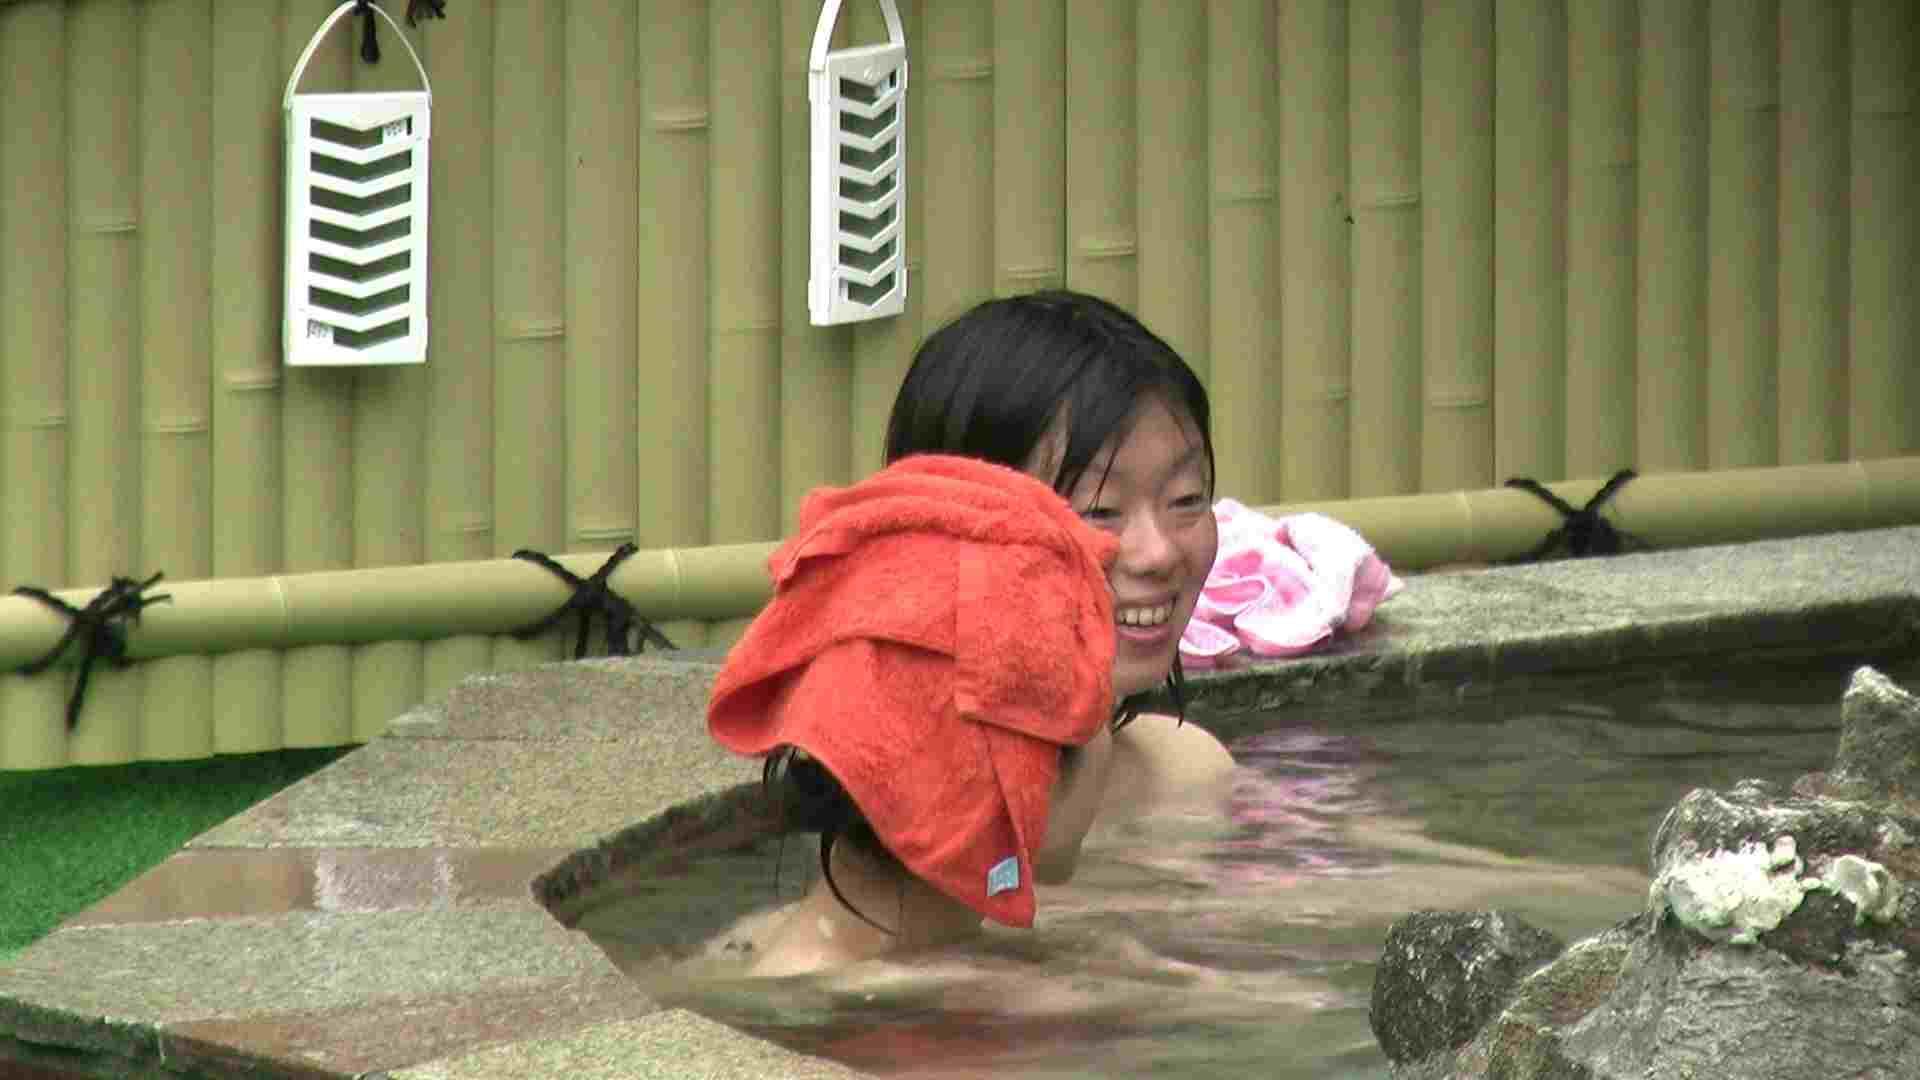 Aquaな露天風呂Vol.187 盗撮   HなOL  96pic 21